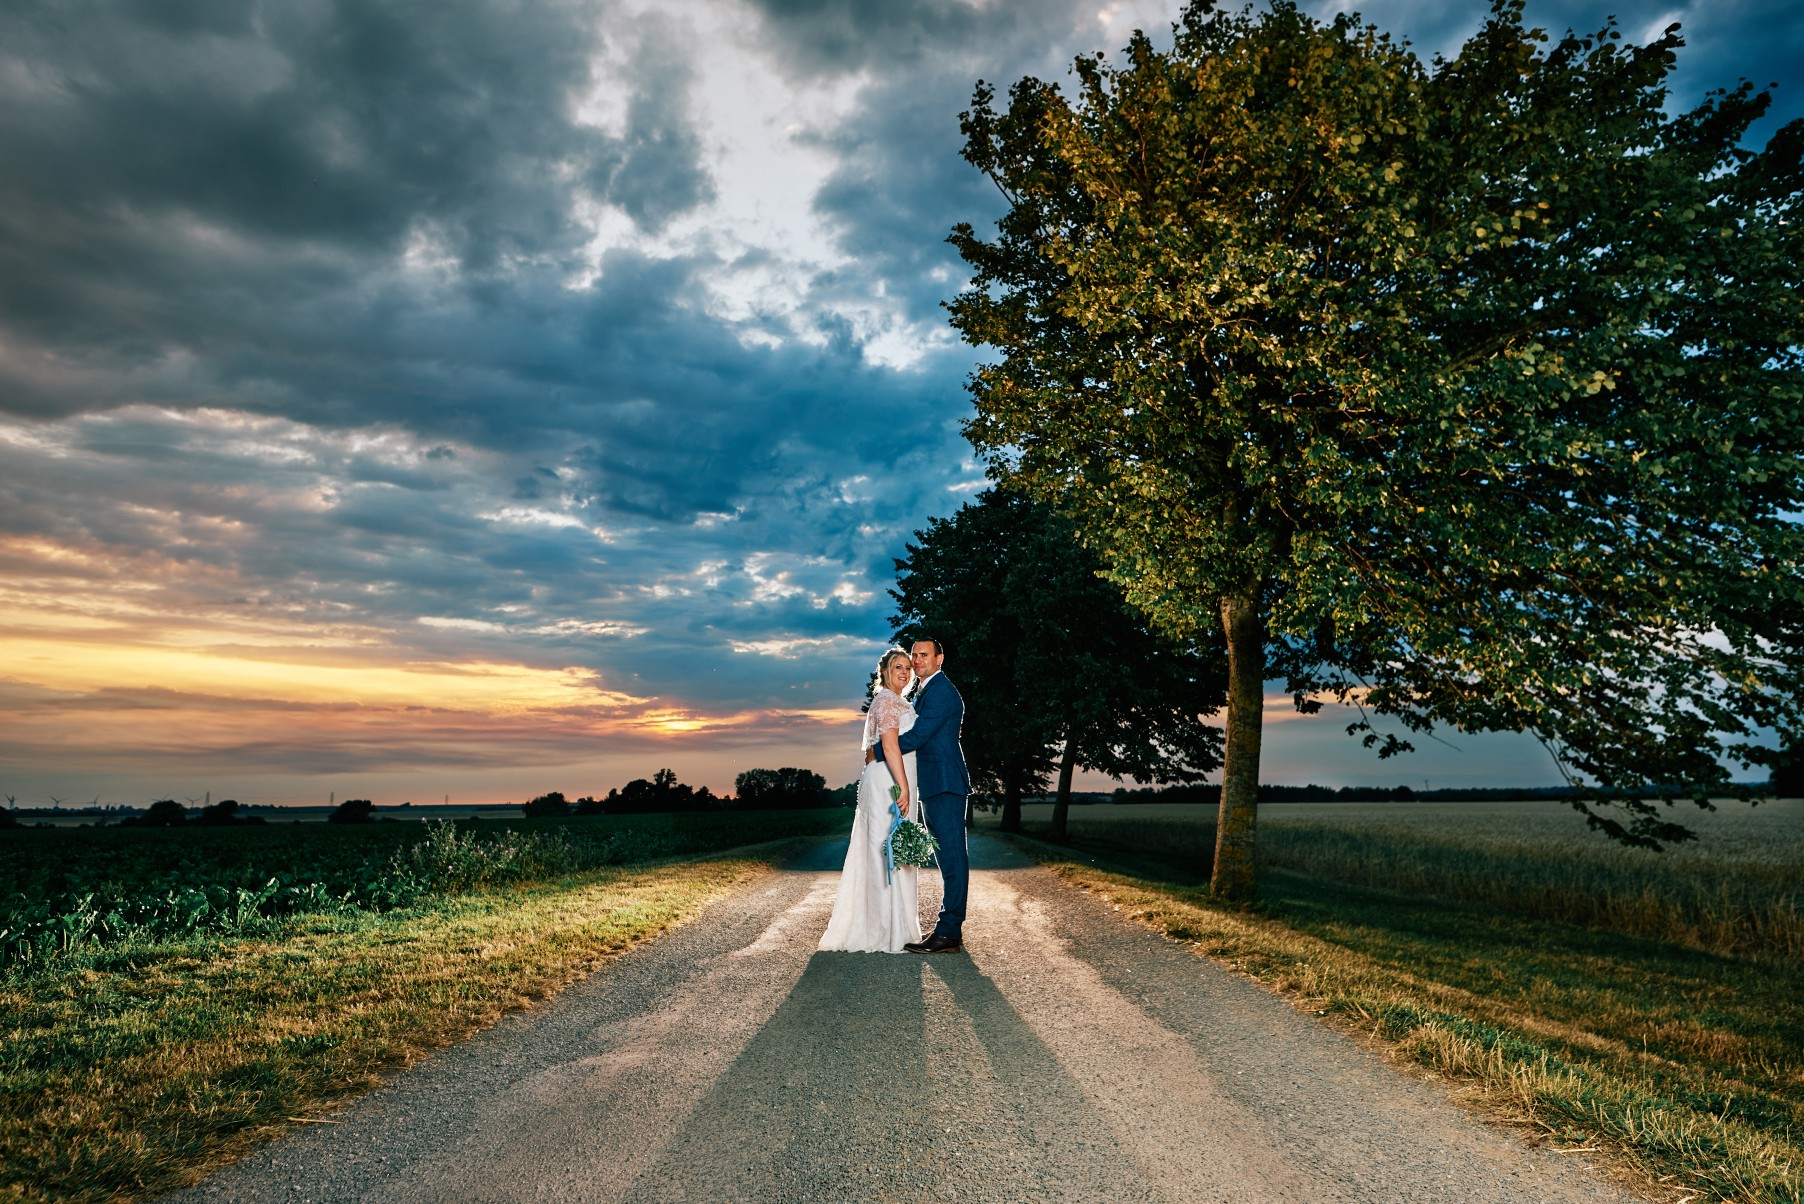 nhs wedding - paramedic wedding - blue and gold wedding - outdoor wedding - micro wedding - surprise wedding